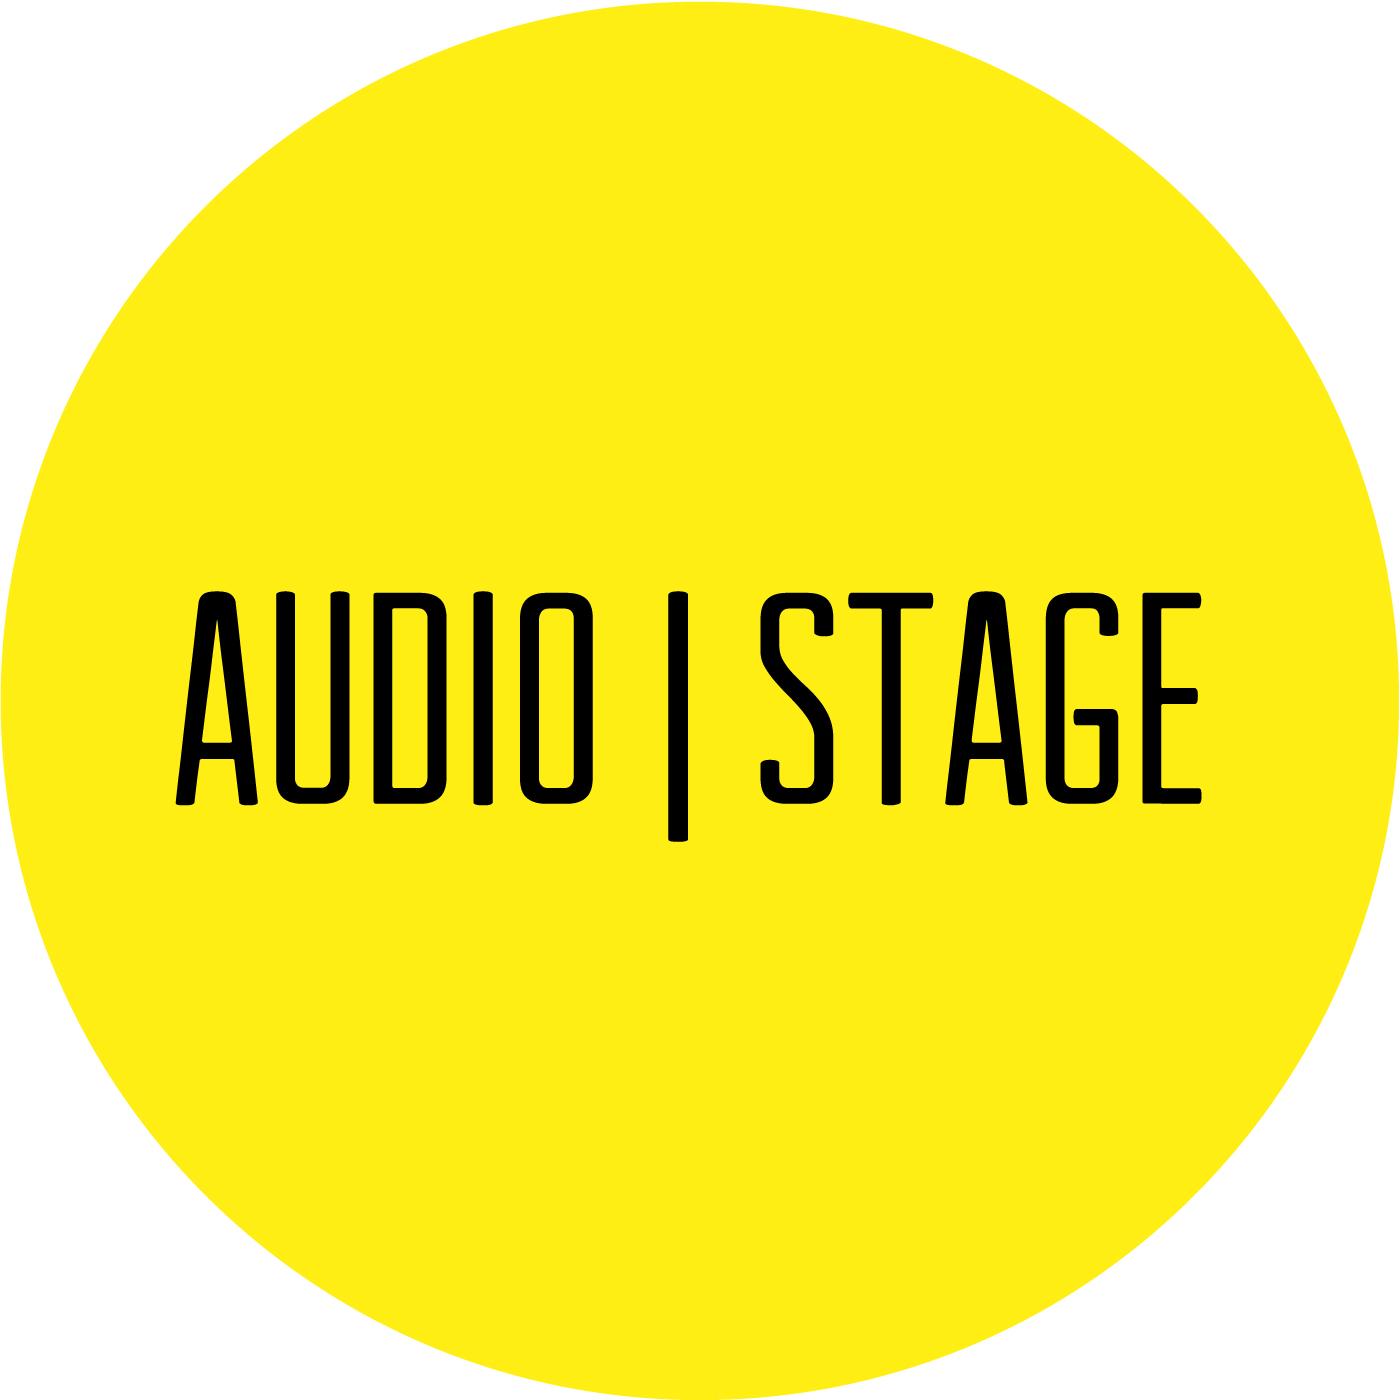 Audiostage